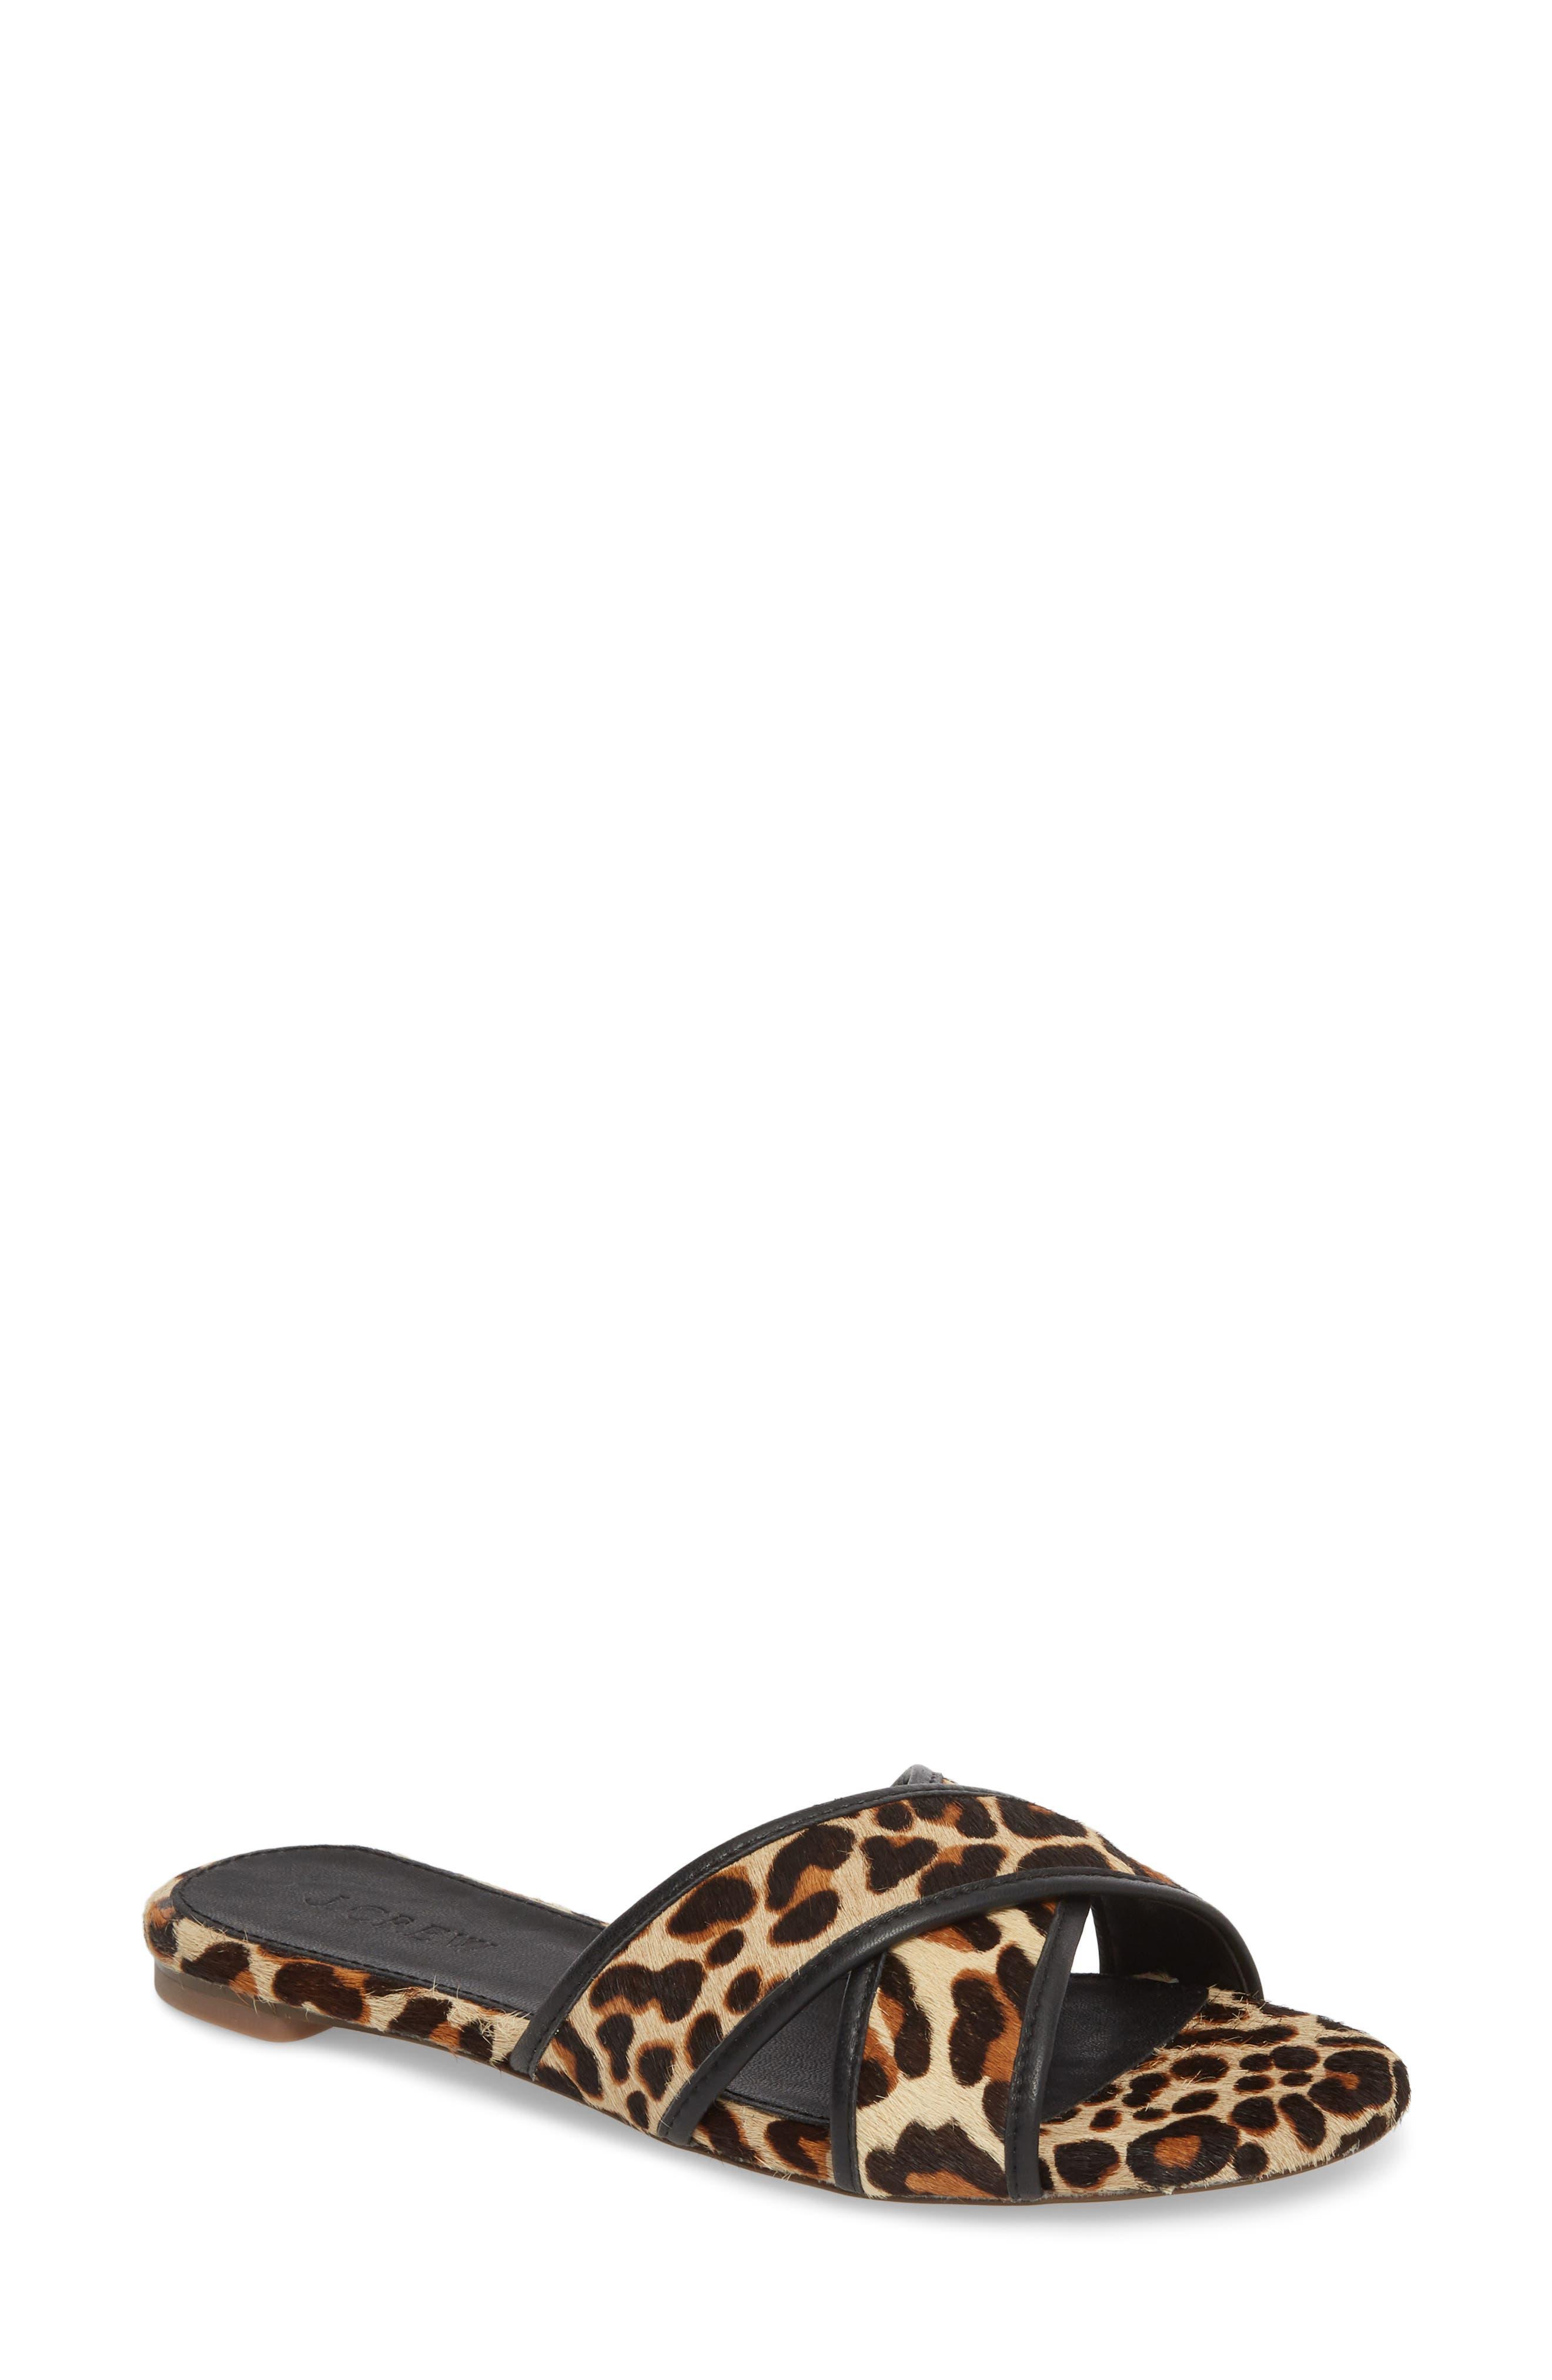 Cora Genuine Calf Hair Slide Sandal,                         Main,                         color, Chocolate Sepia